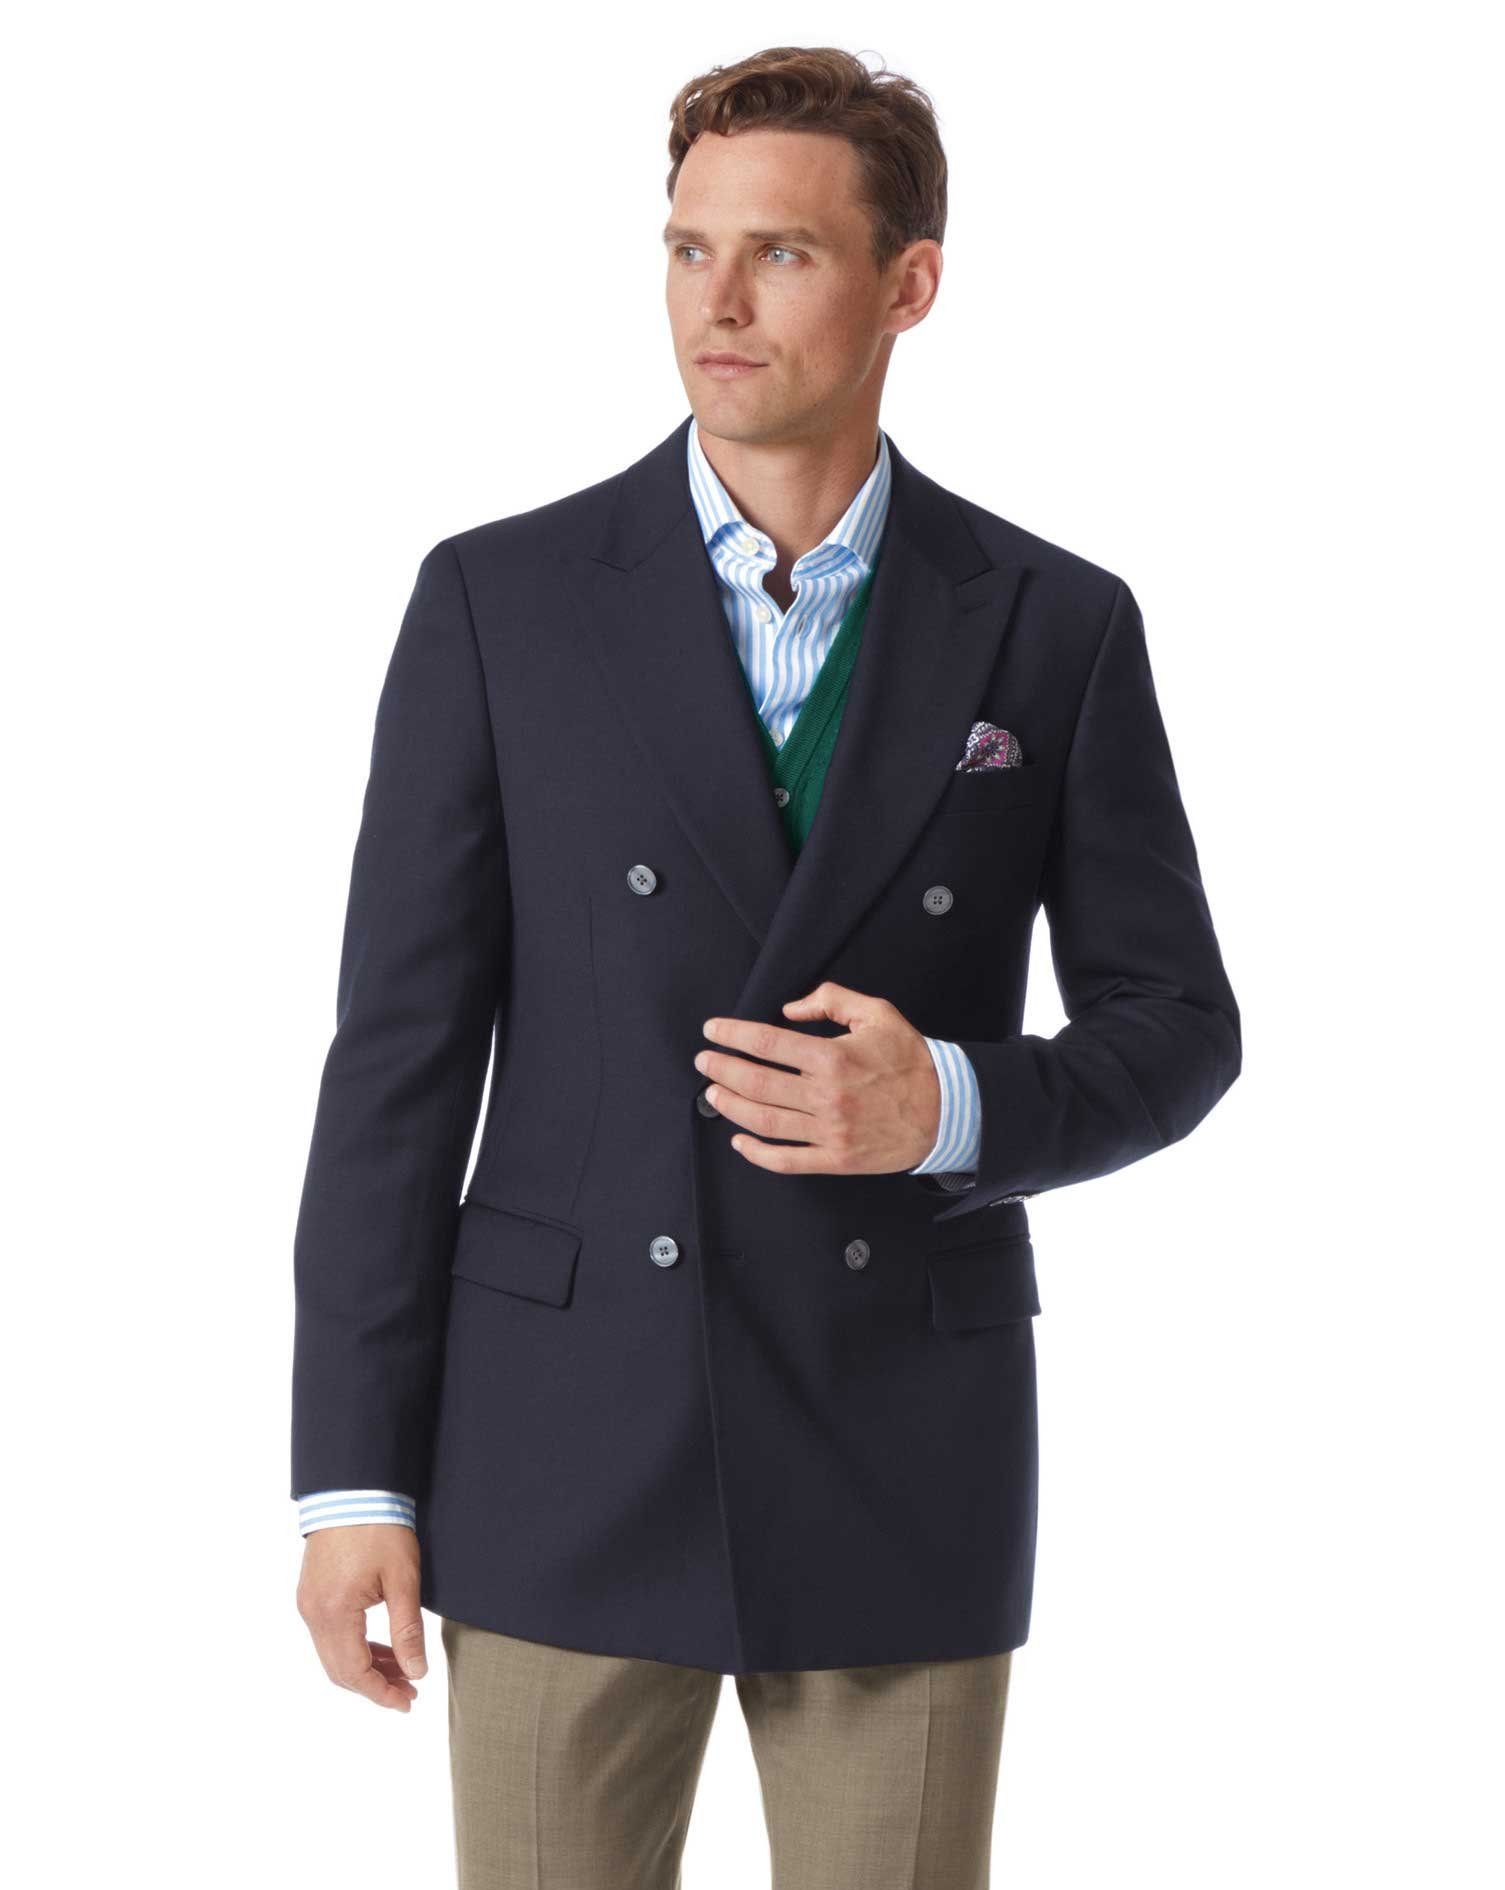 Slim Fit Navy Double Breasted Wool Wool Blazer Size 44 Regular by Charles Tyrwhitt